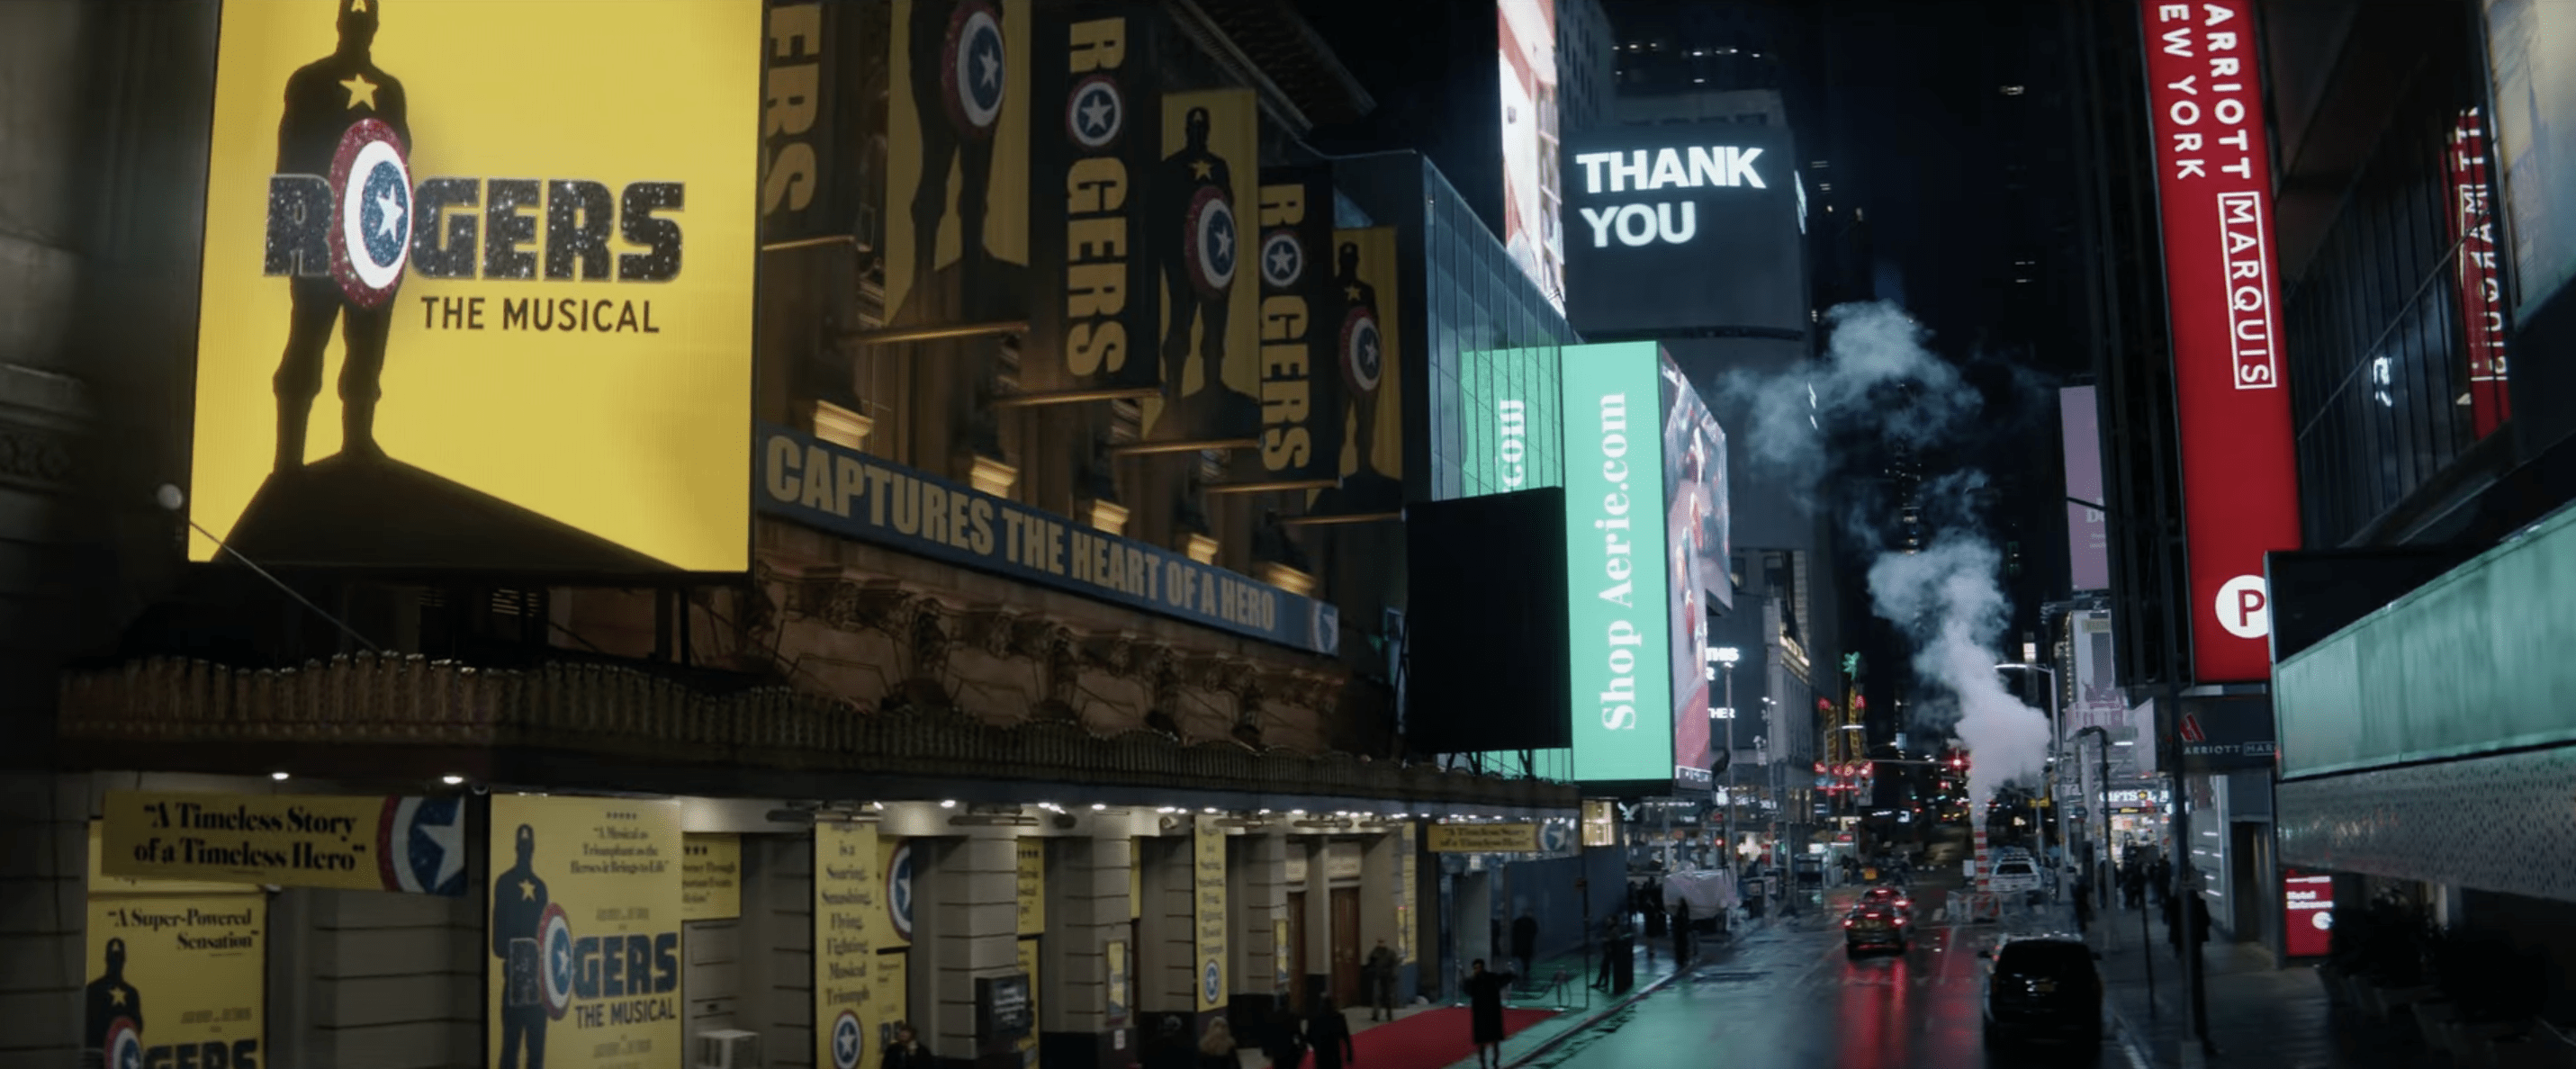 hawkeye trailer breakdown rogers the musical